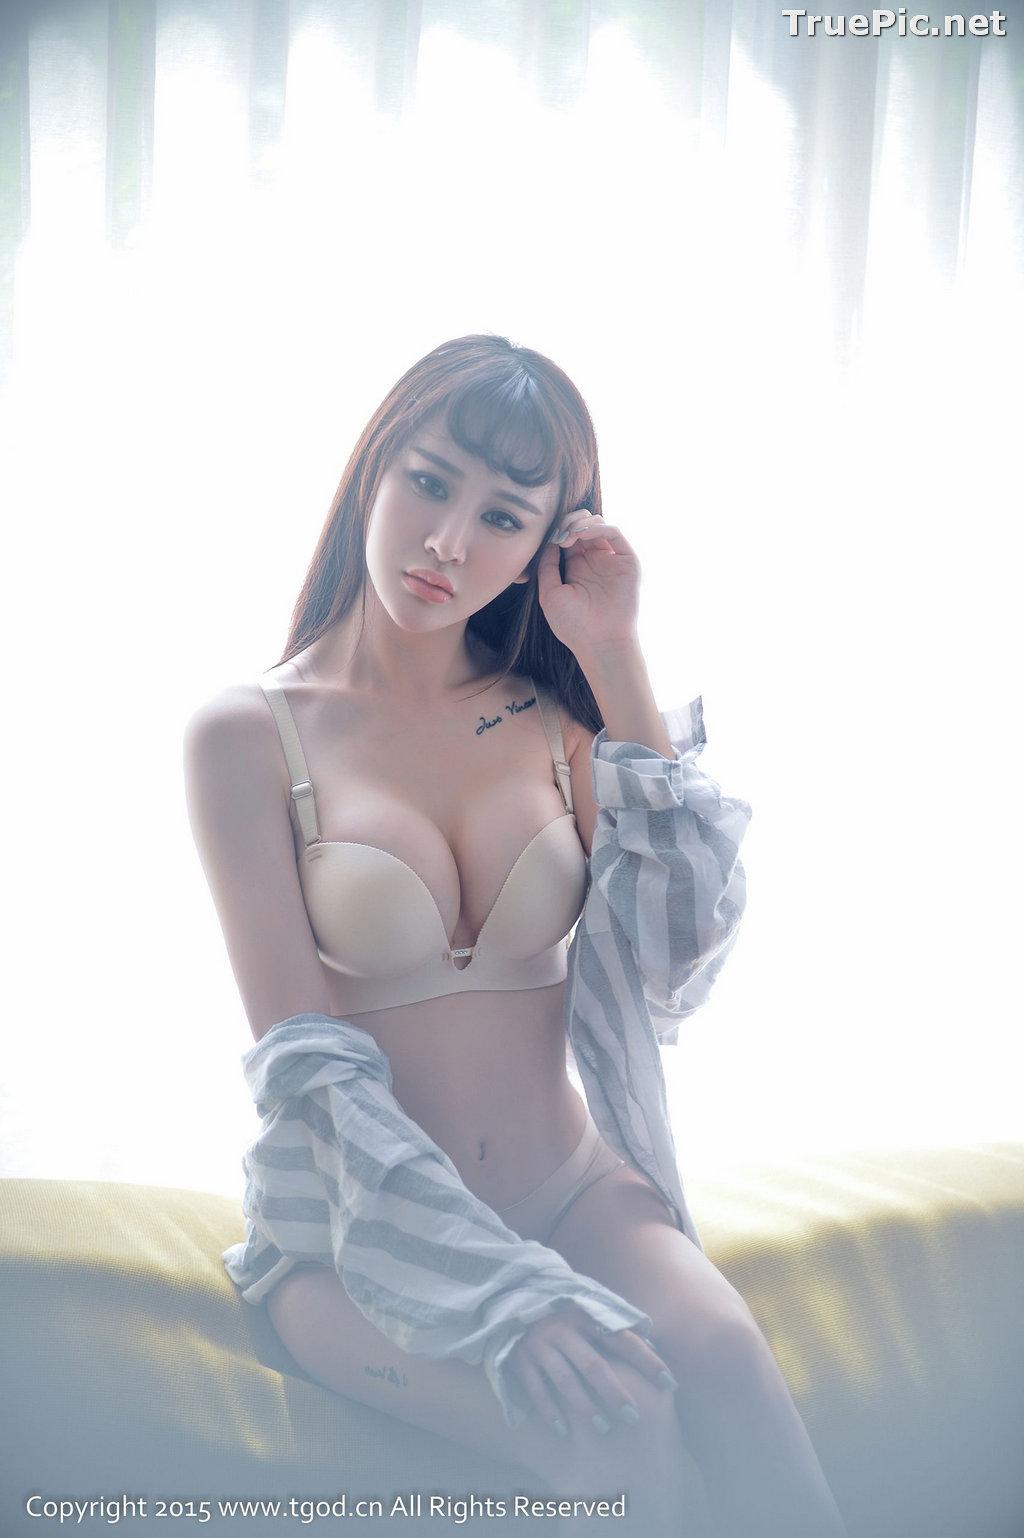 Image TGOD 2015-11-10 - Chinese Sexy Model - Cheryl (青树) - TruePic.net - Picture-1